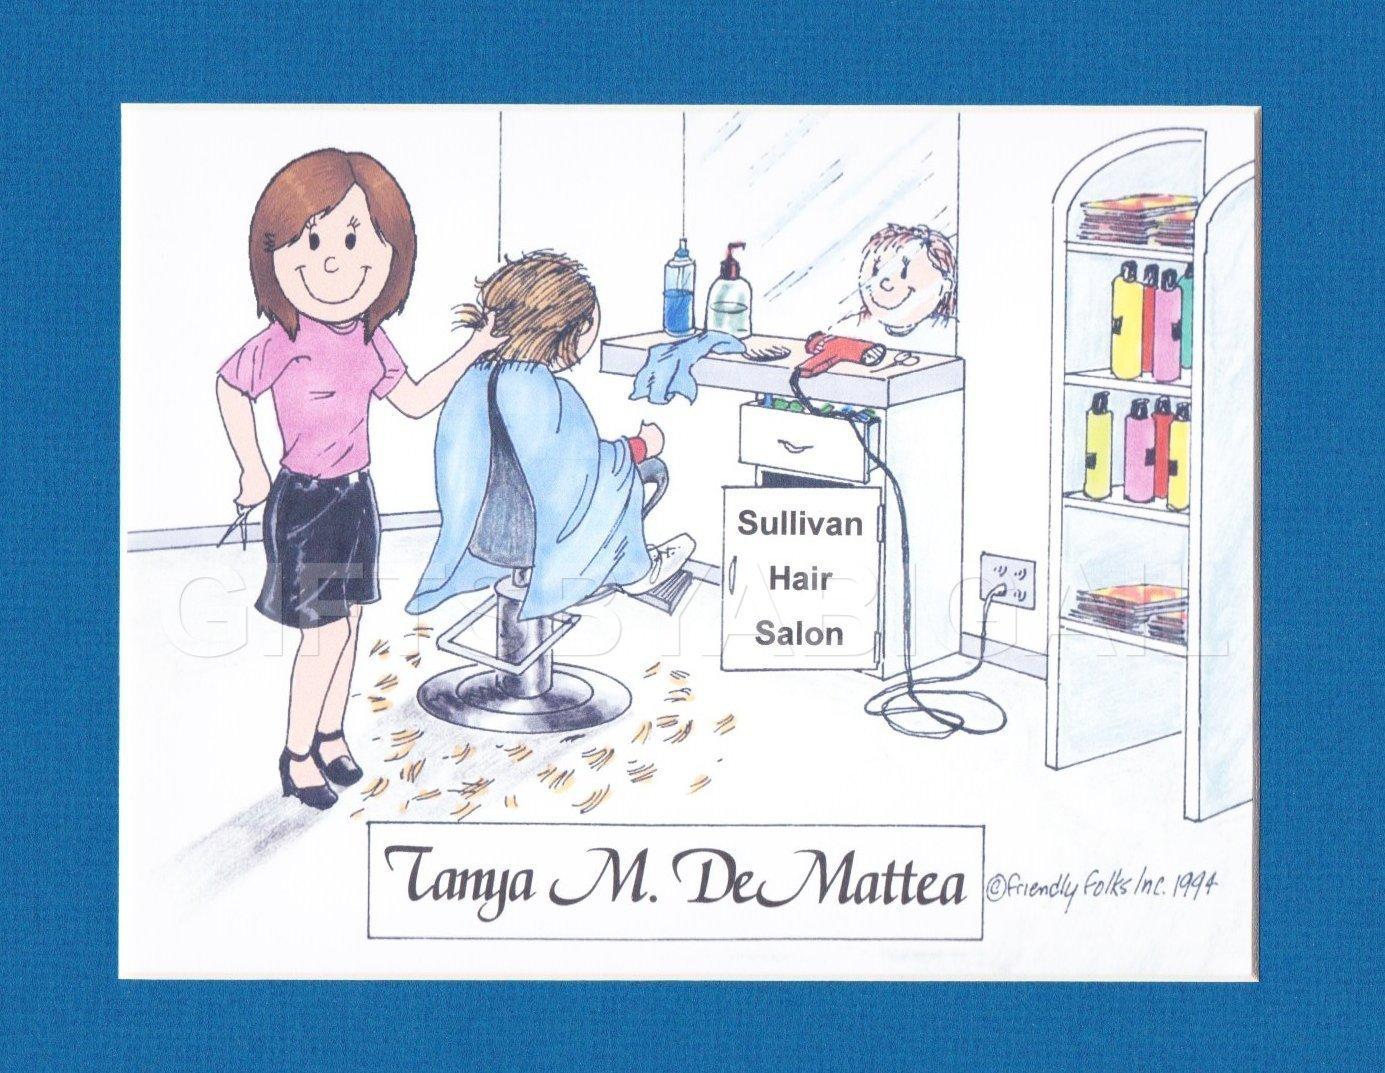 Hair Dresser Gift Personalized Custom Cartoon Print 8x10, 9x12 Magnet or Keychain